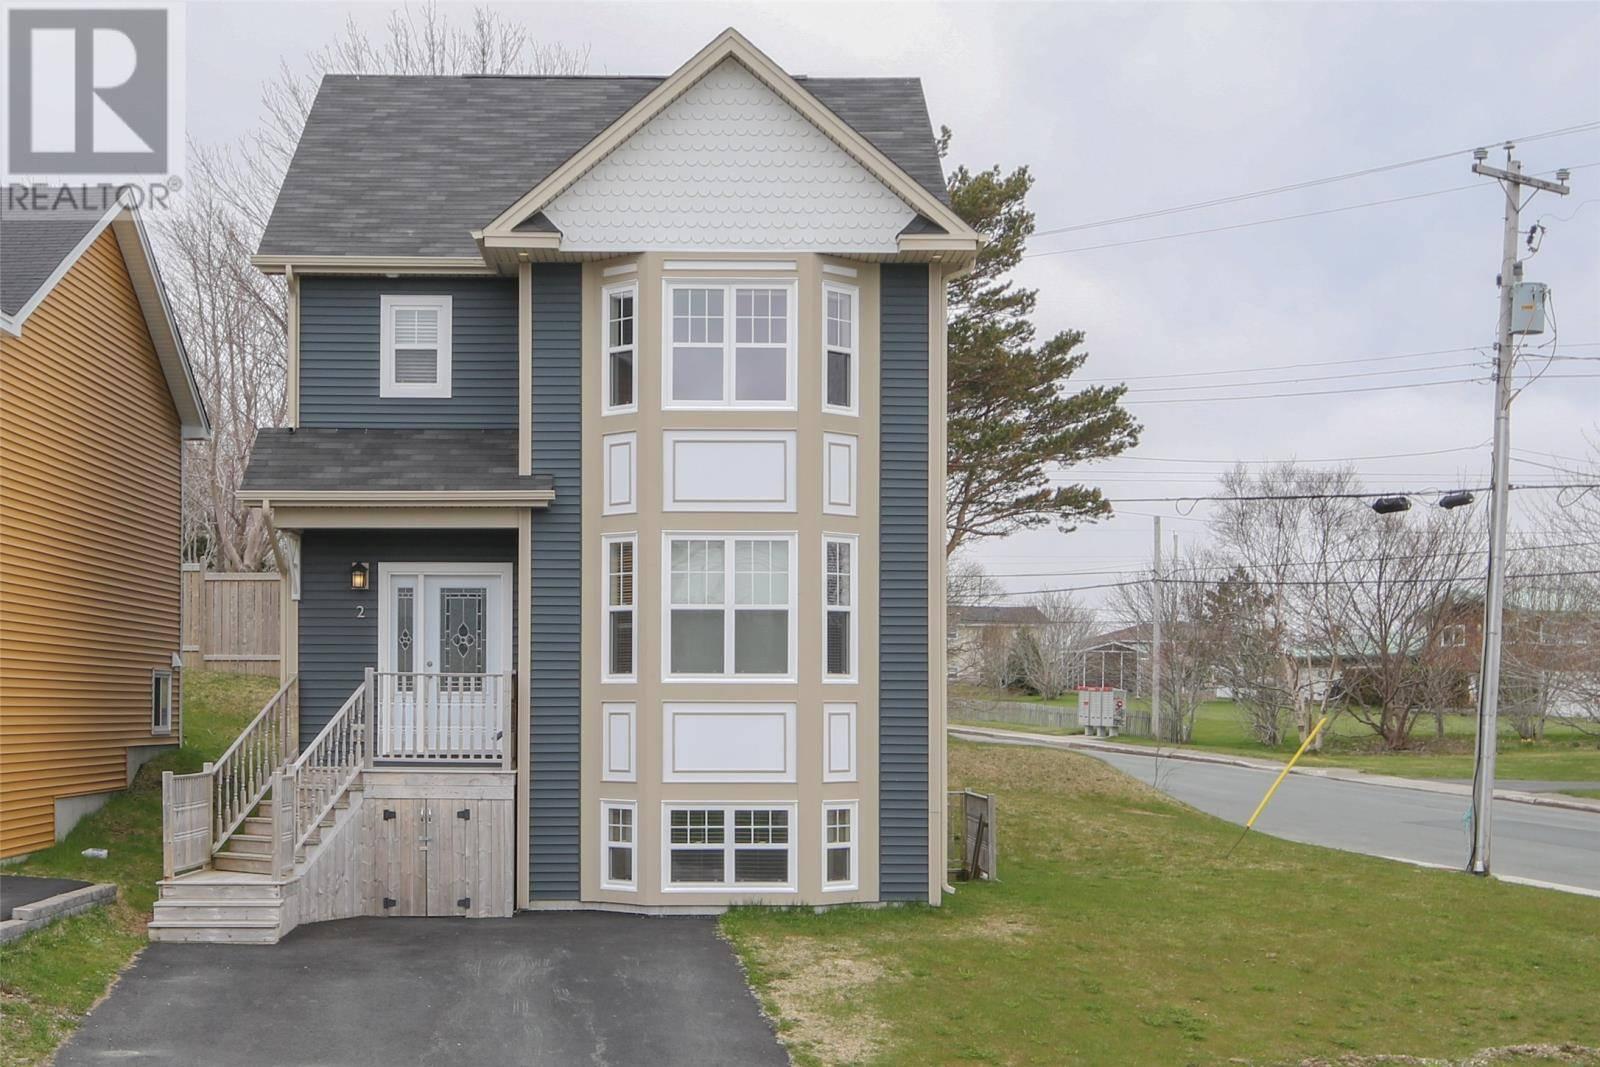 House for sale at 2 Parkridge Dr St. John's Newfoundland - MLS: 1198920